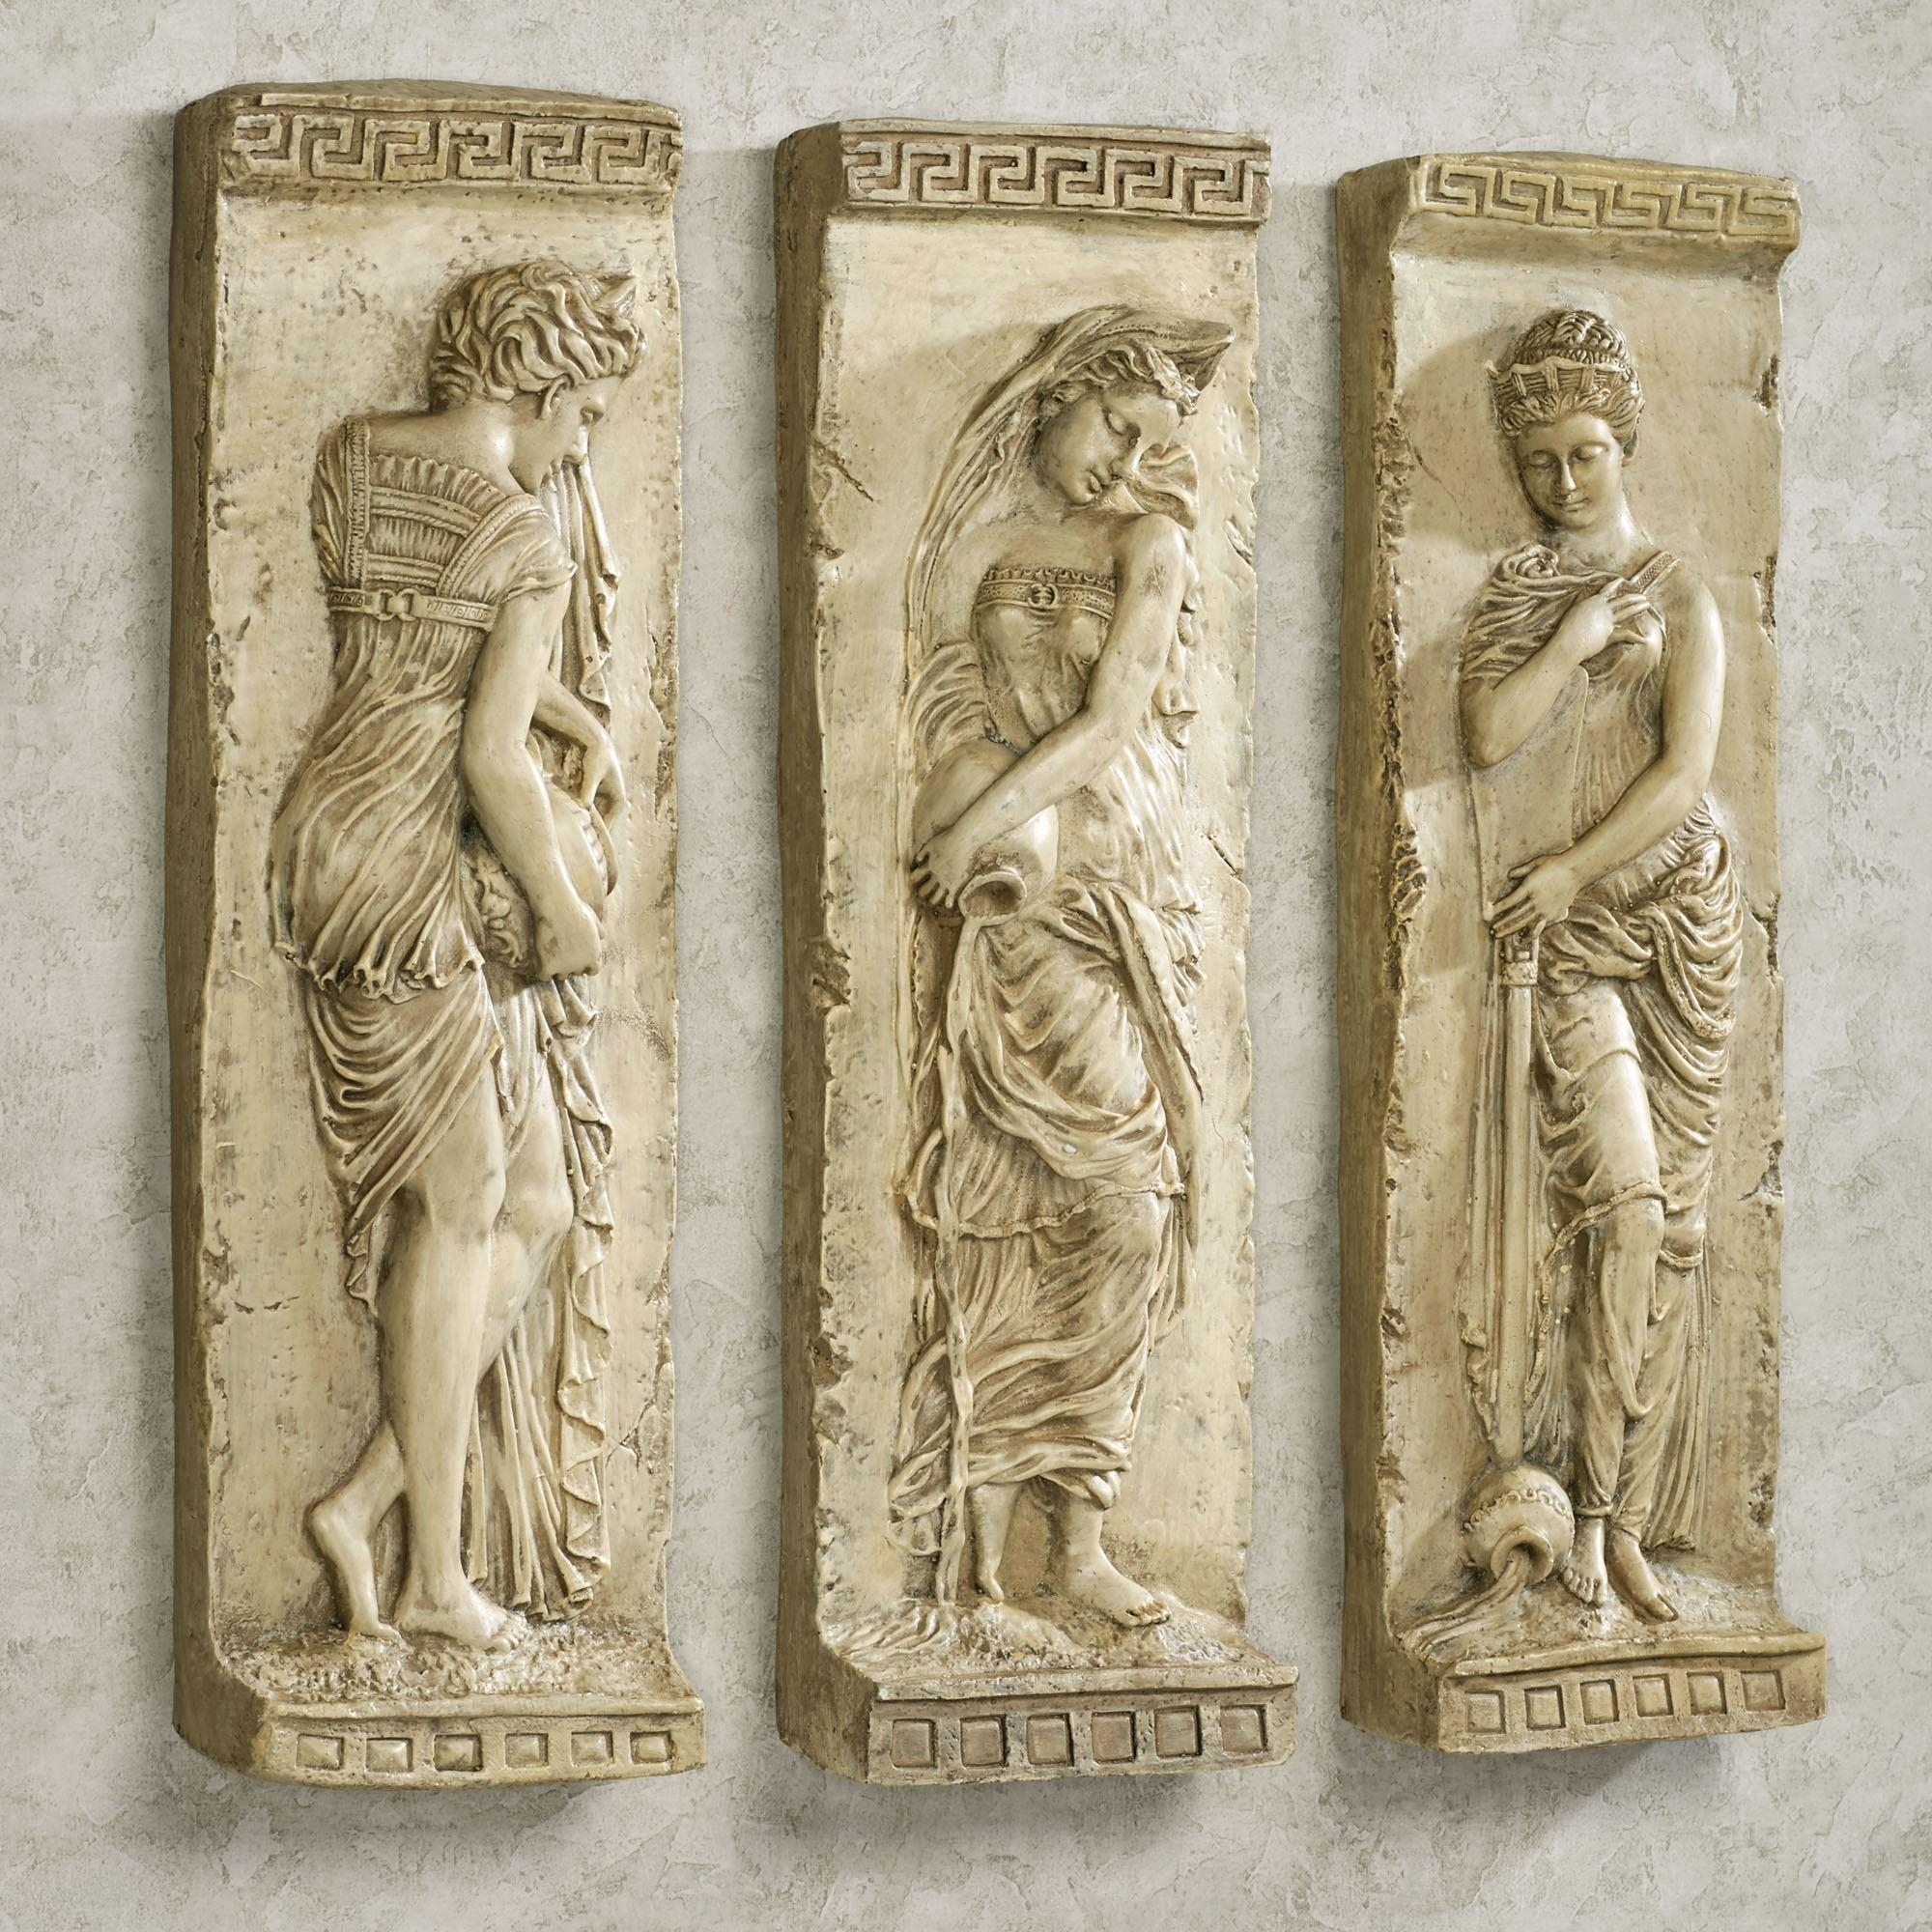 Danaides Of Argos Ii Wall Art Set Throughout Ancient Greek Wall Art (Image 3 of 20)